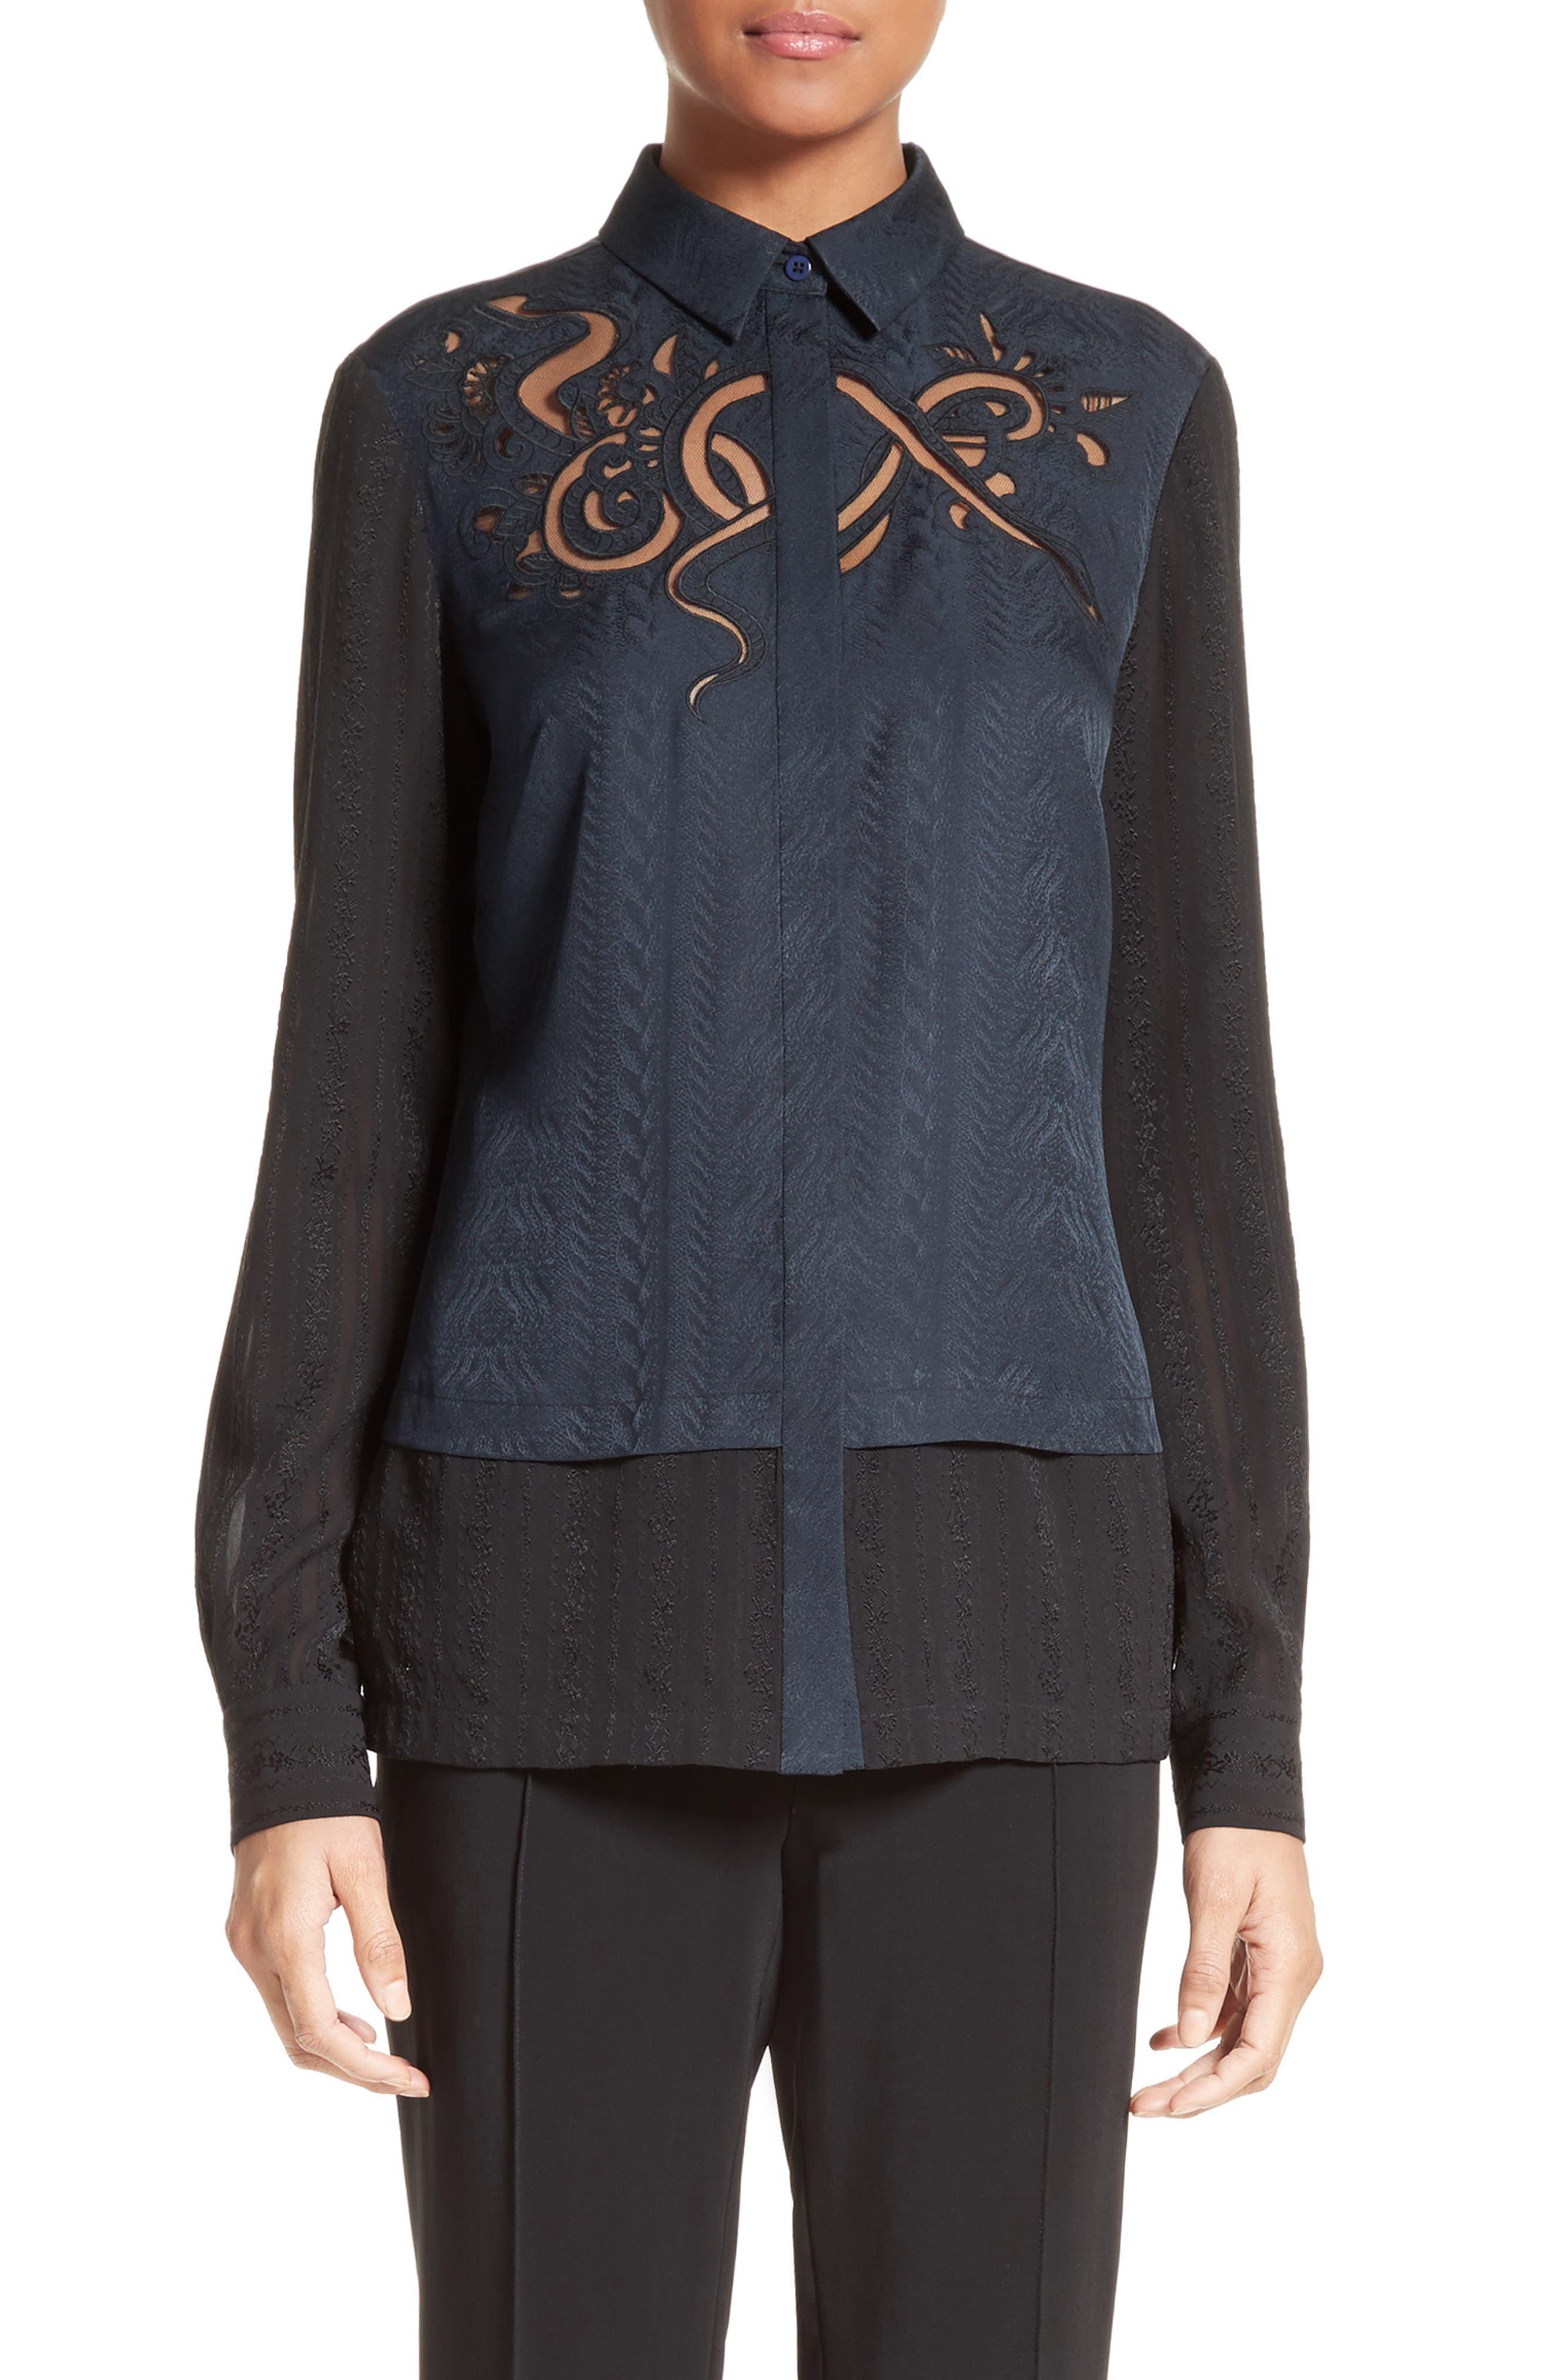 Yigal Azrouël Embroidered Silk Jacquard Blouse